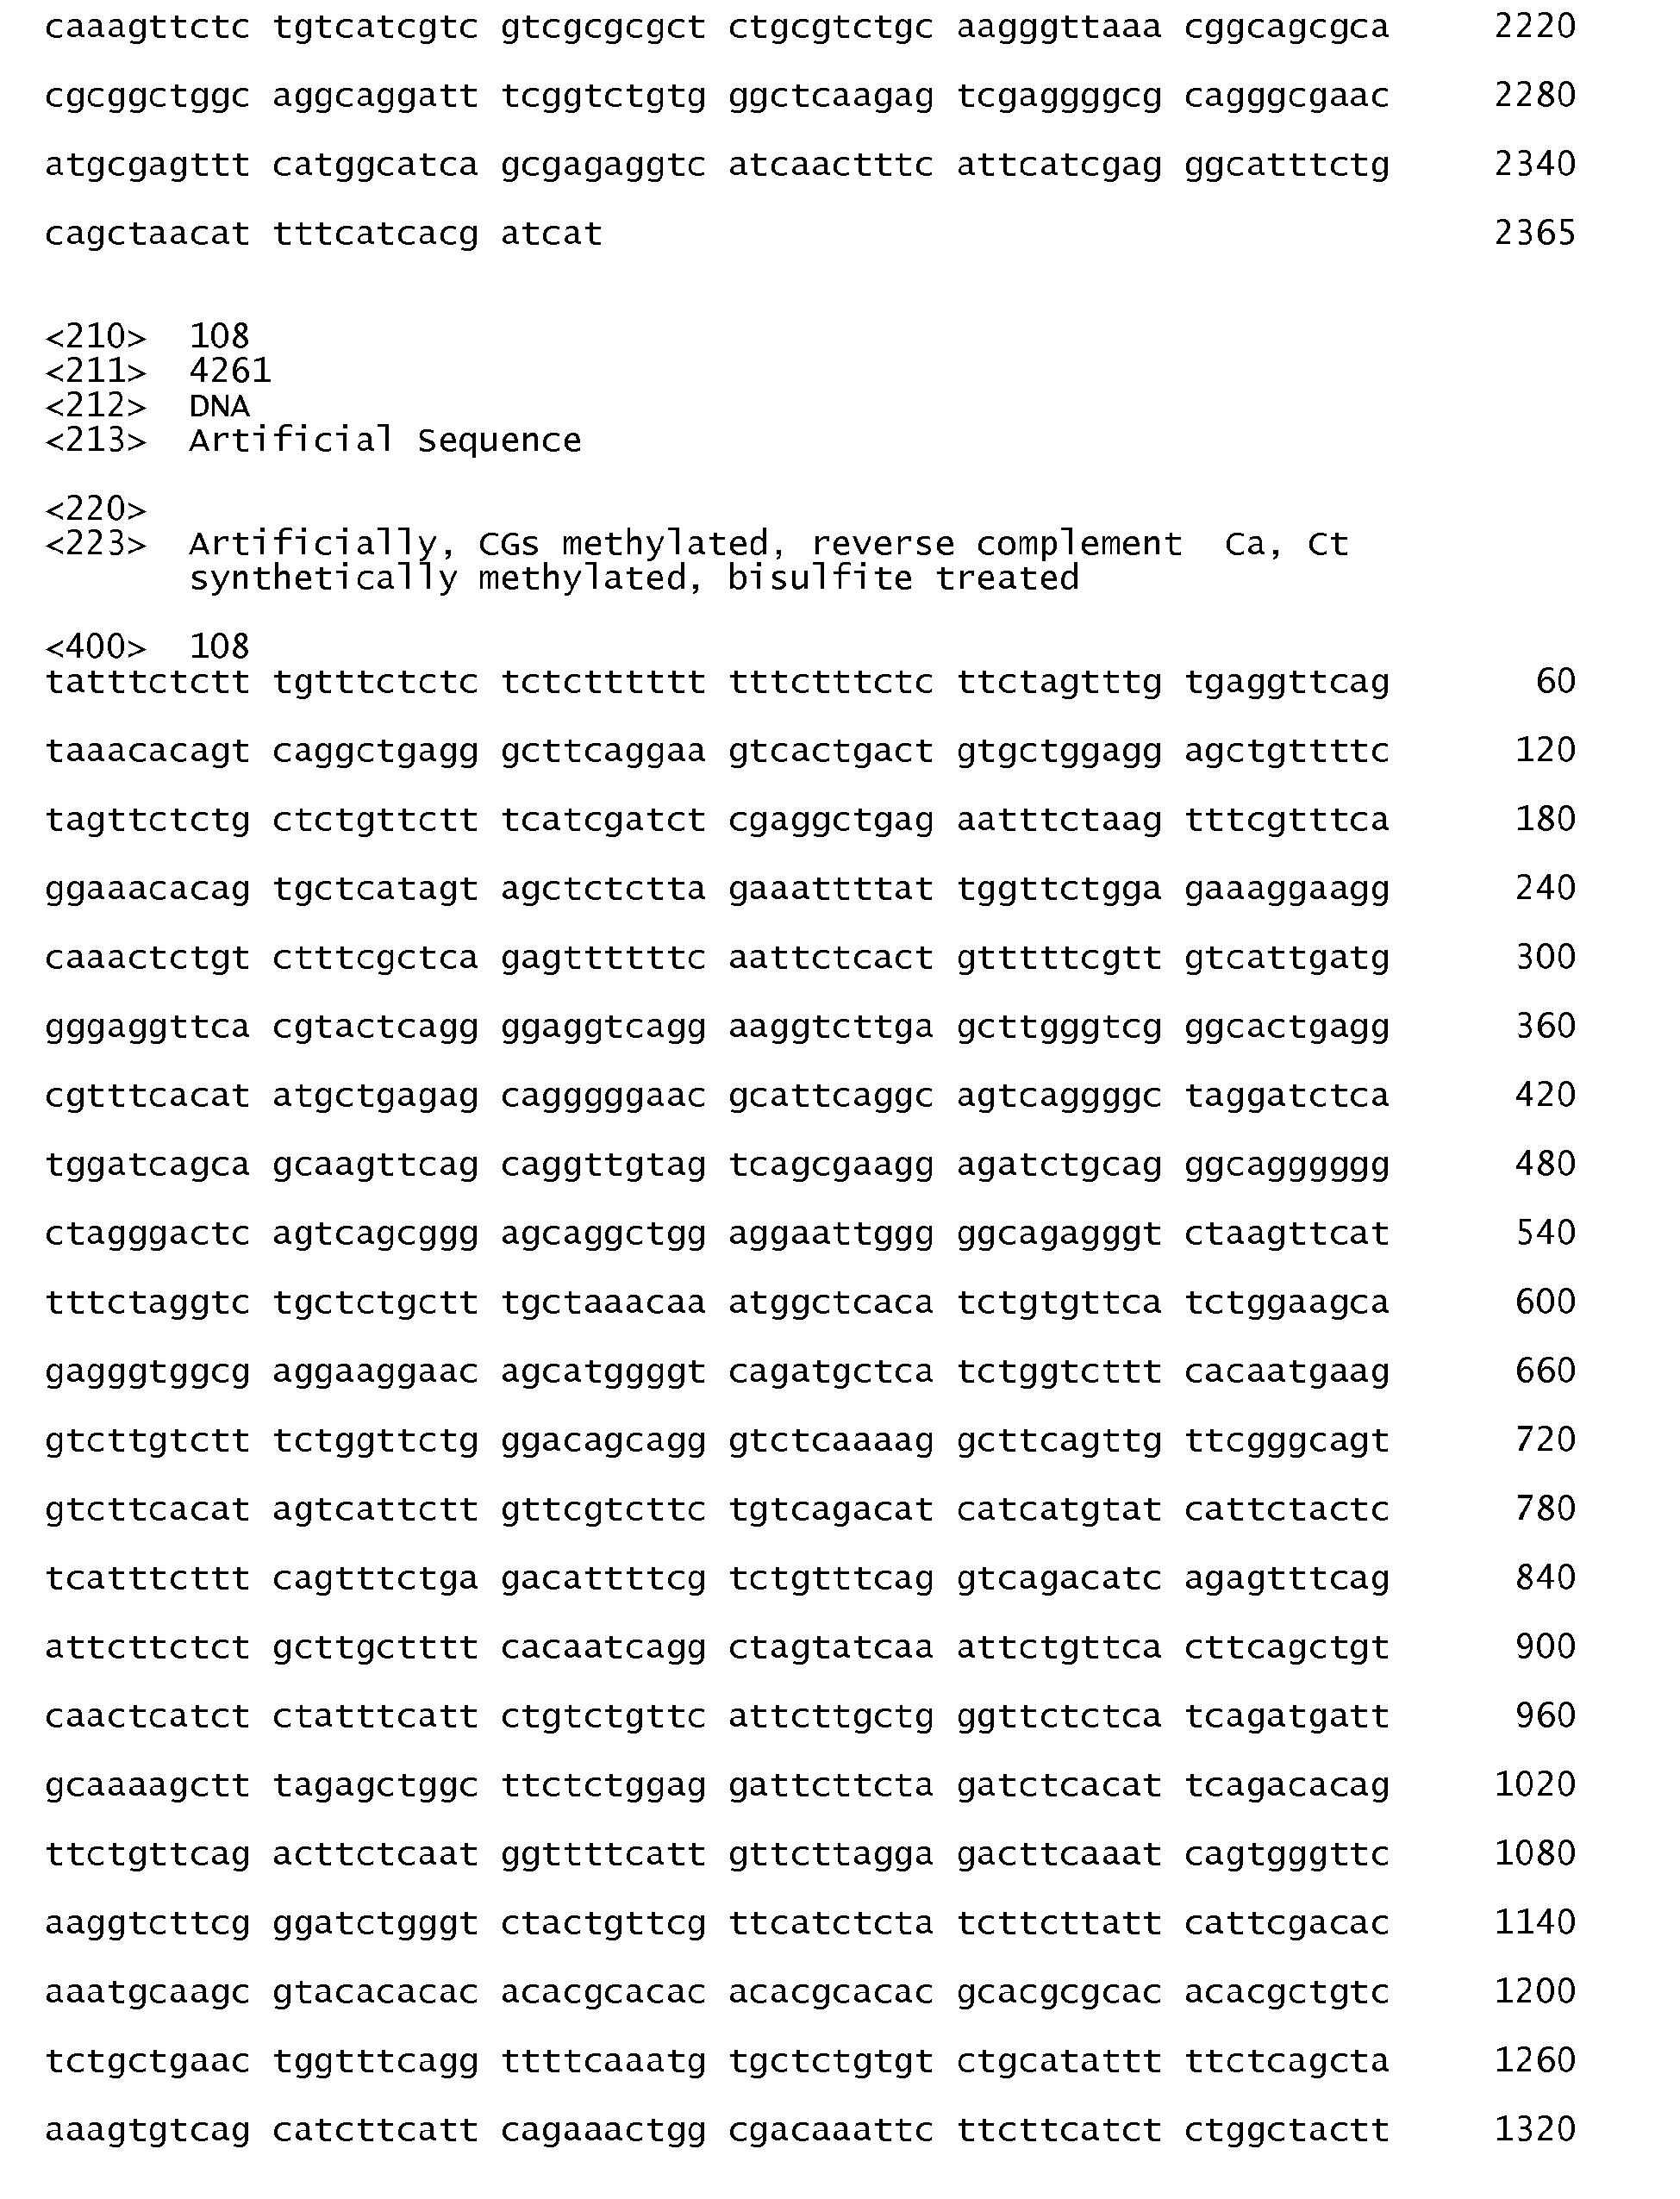 Figure imgb0271